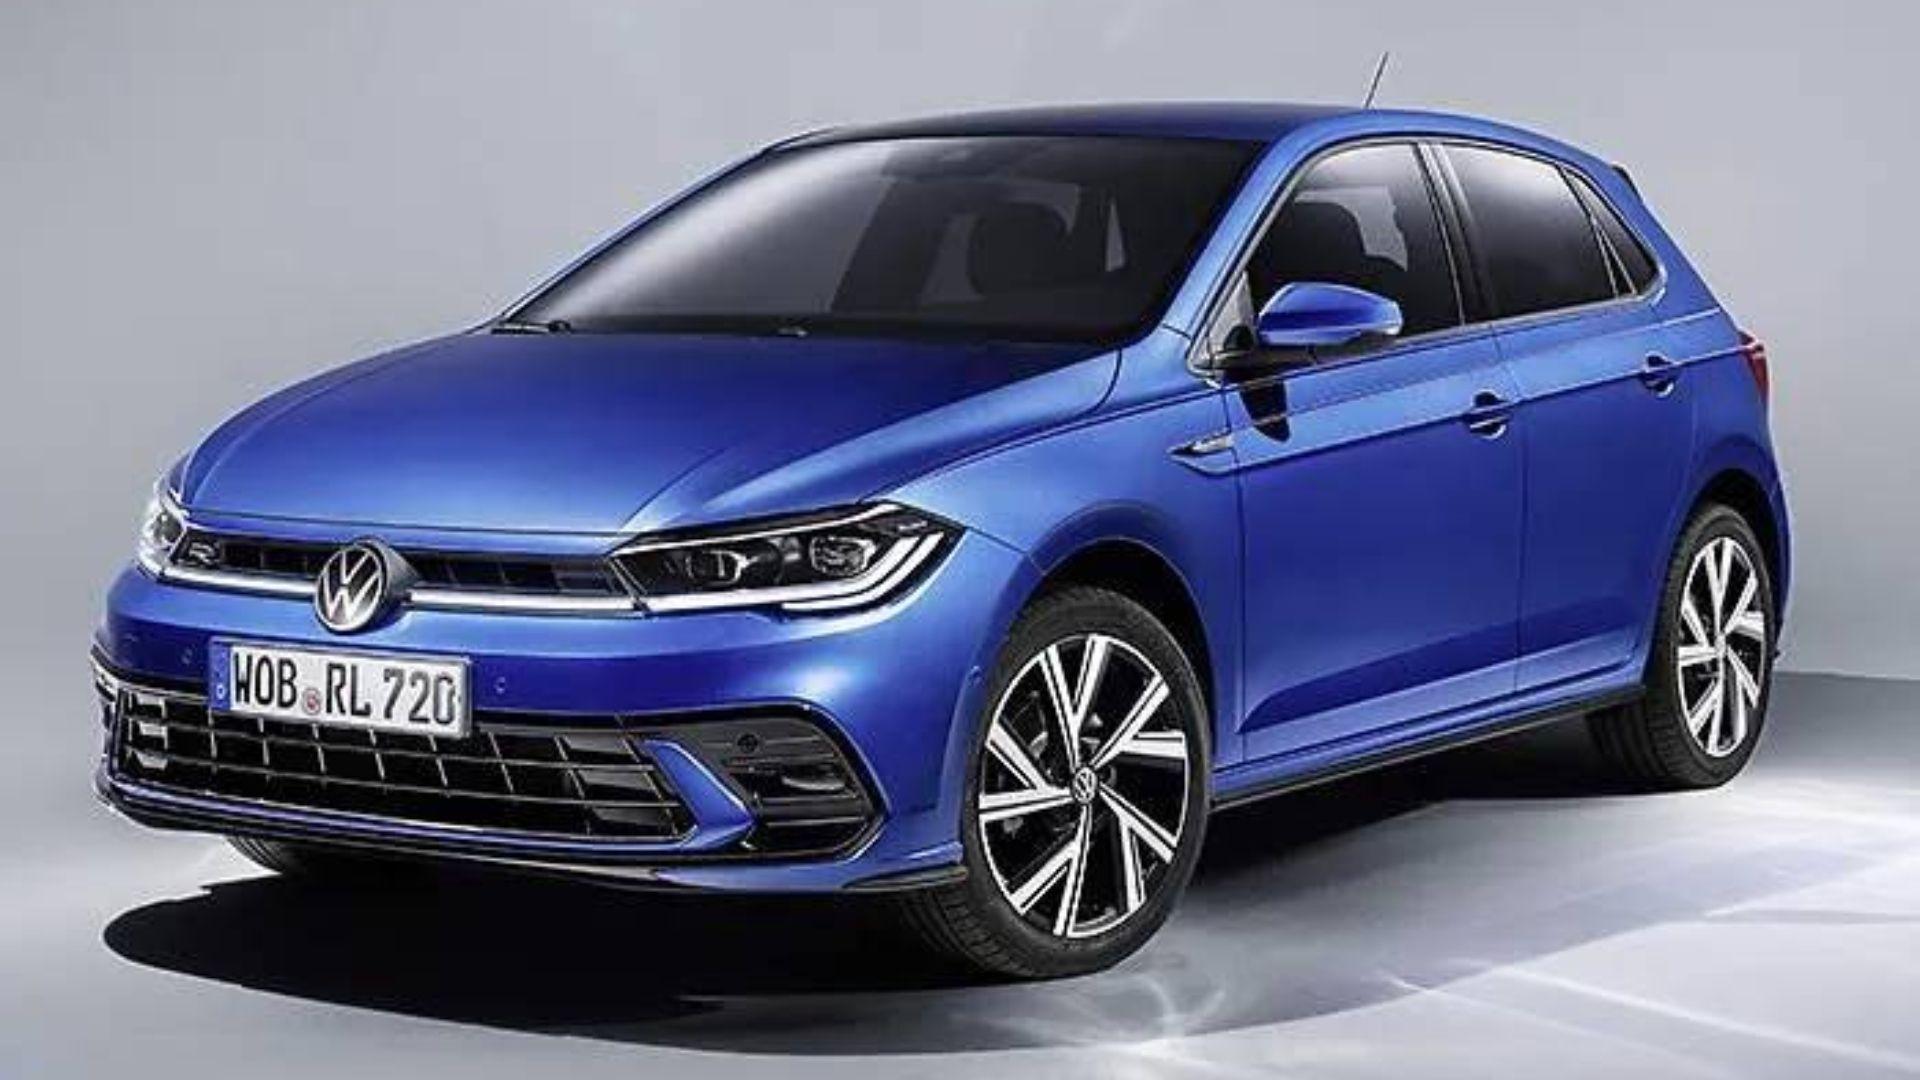 Volkswagen mostra a primeira imagem do novo Polo GTI